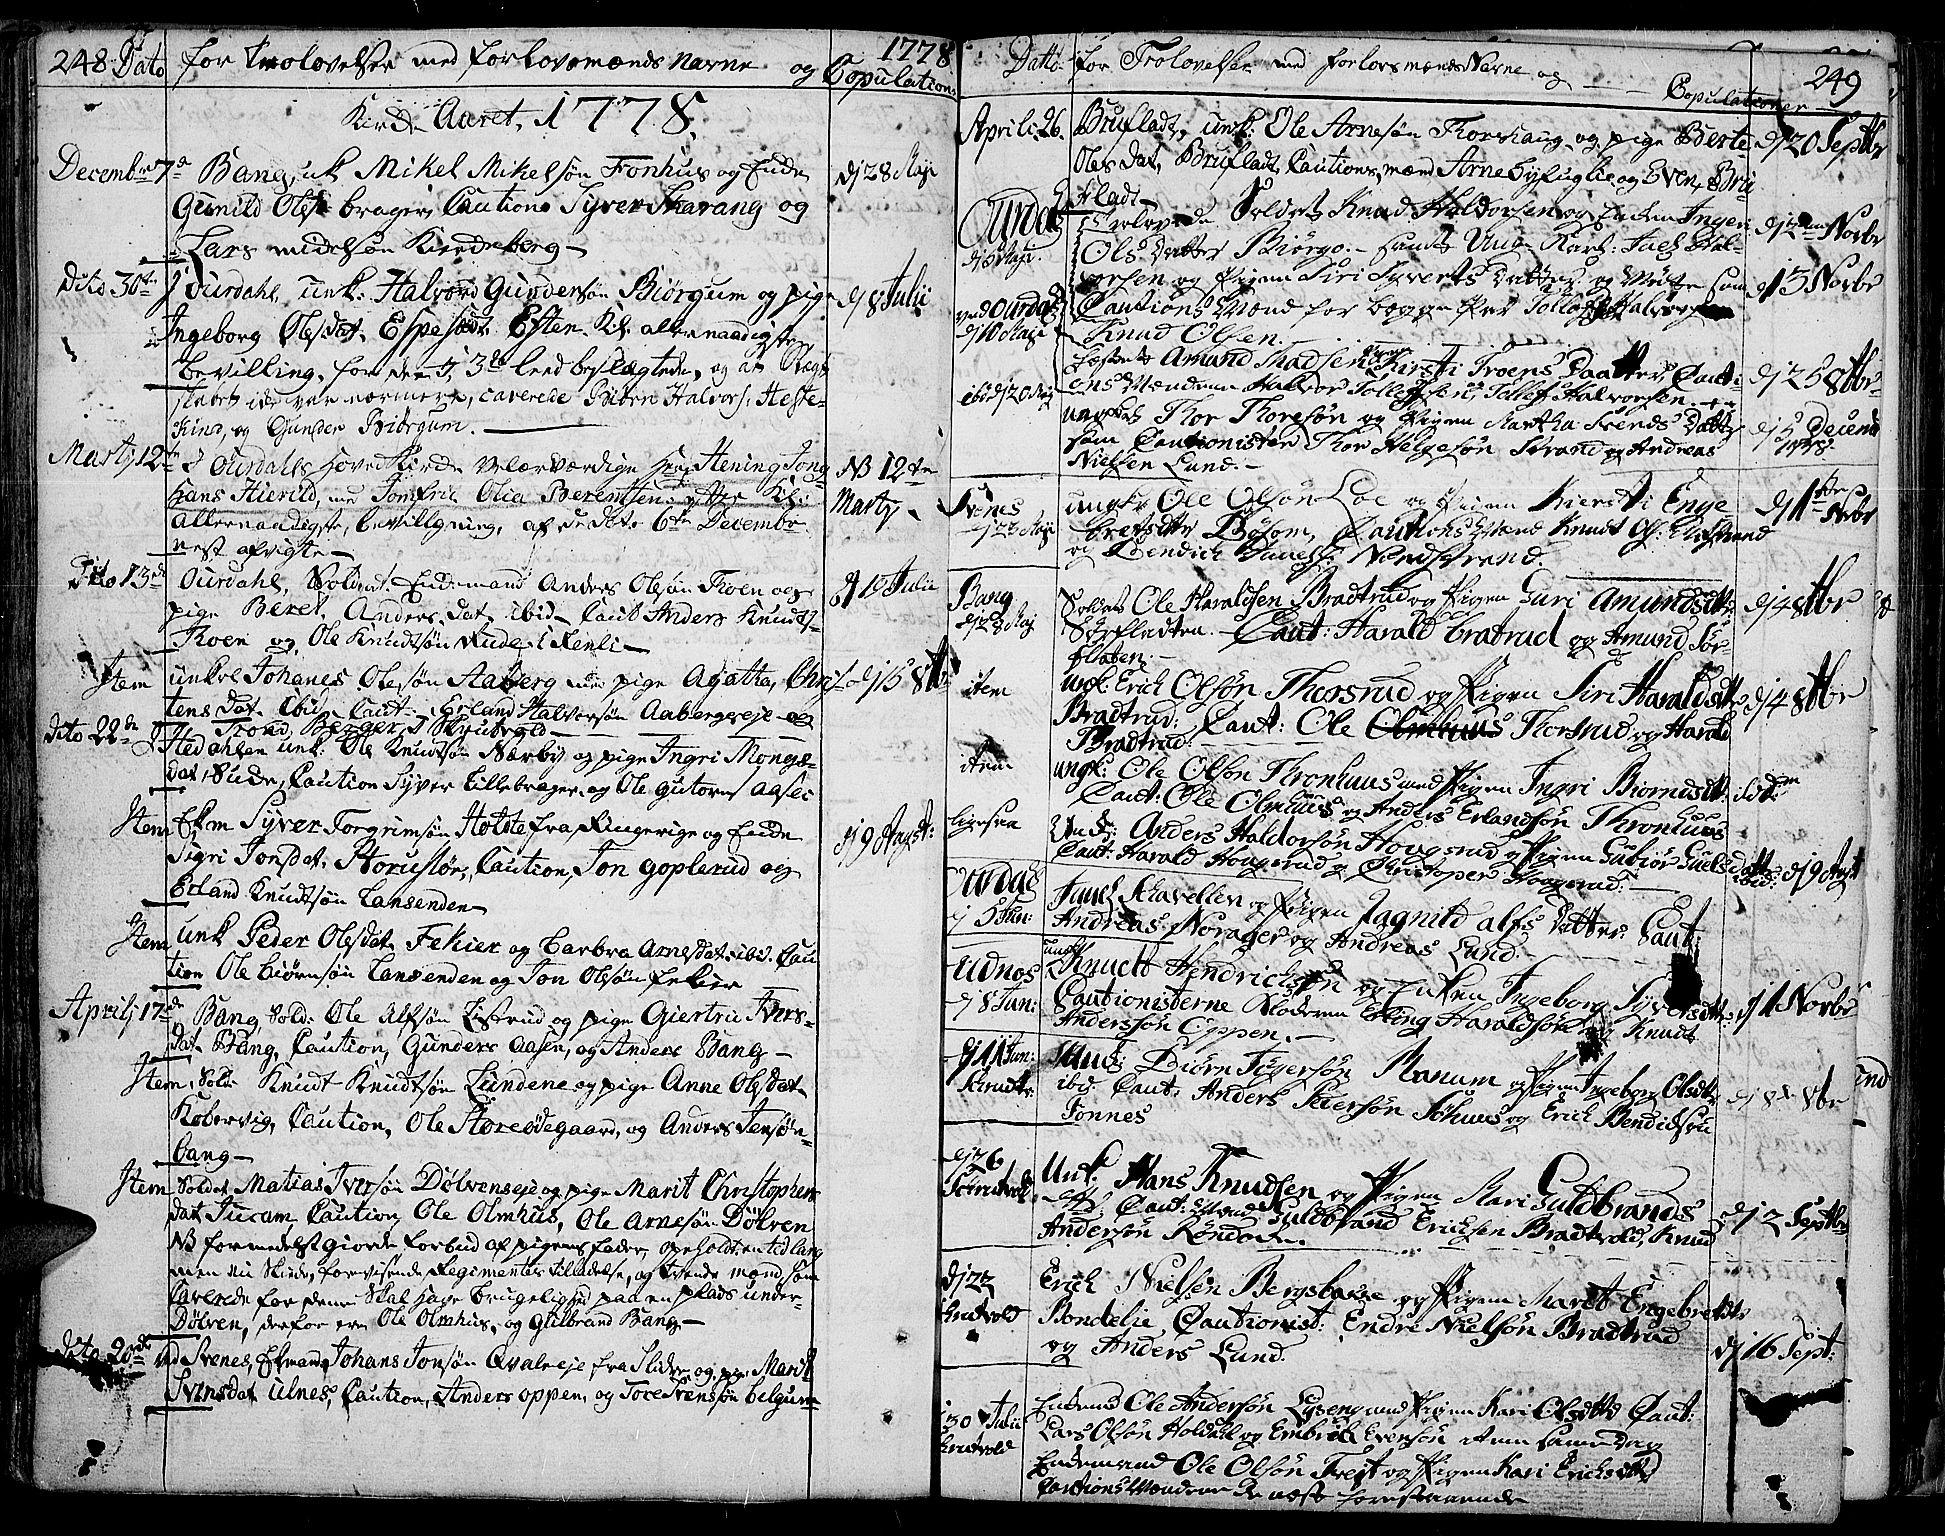 SAH, Aurdal prestekontor, Ministerialbok nr. 5, 1763-1781, s. 248-249